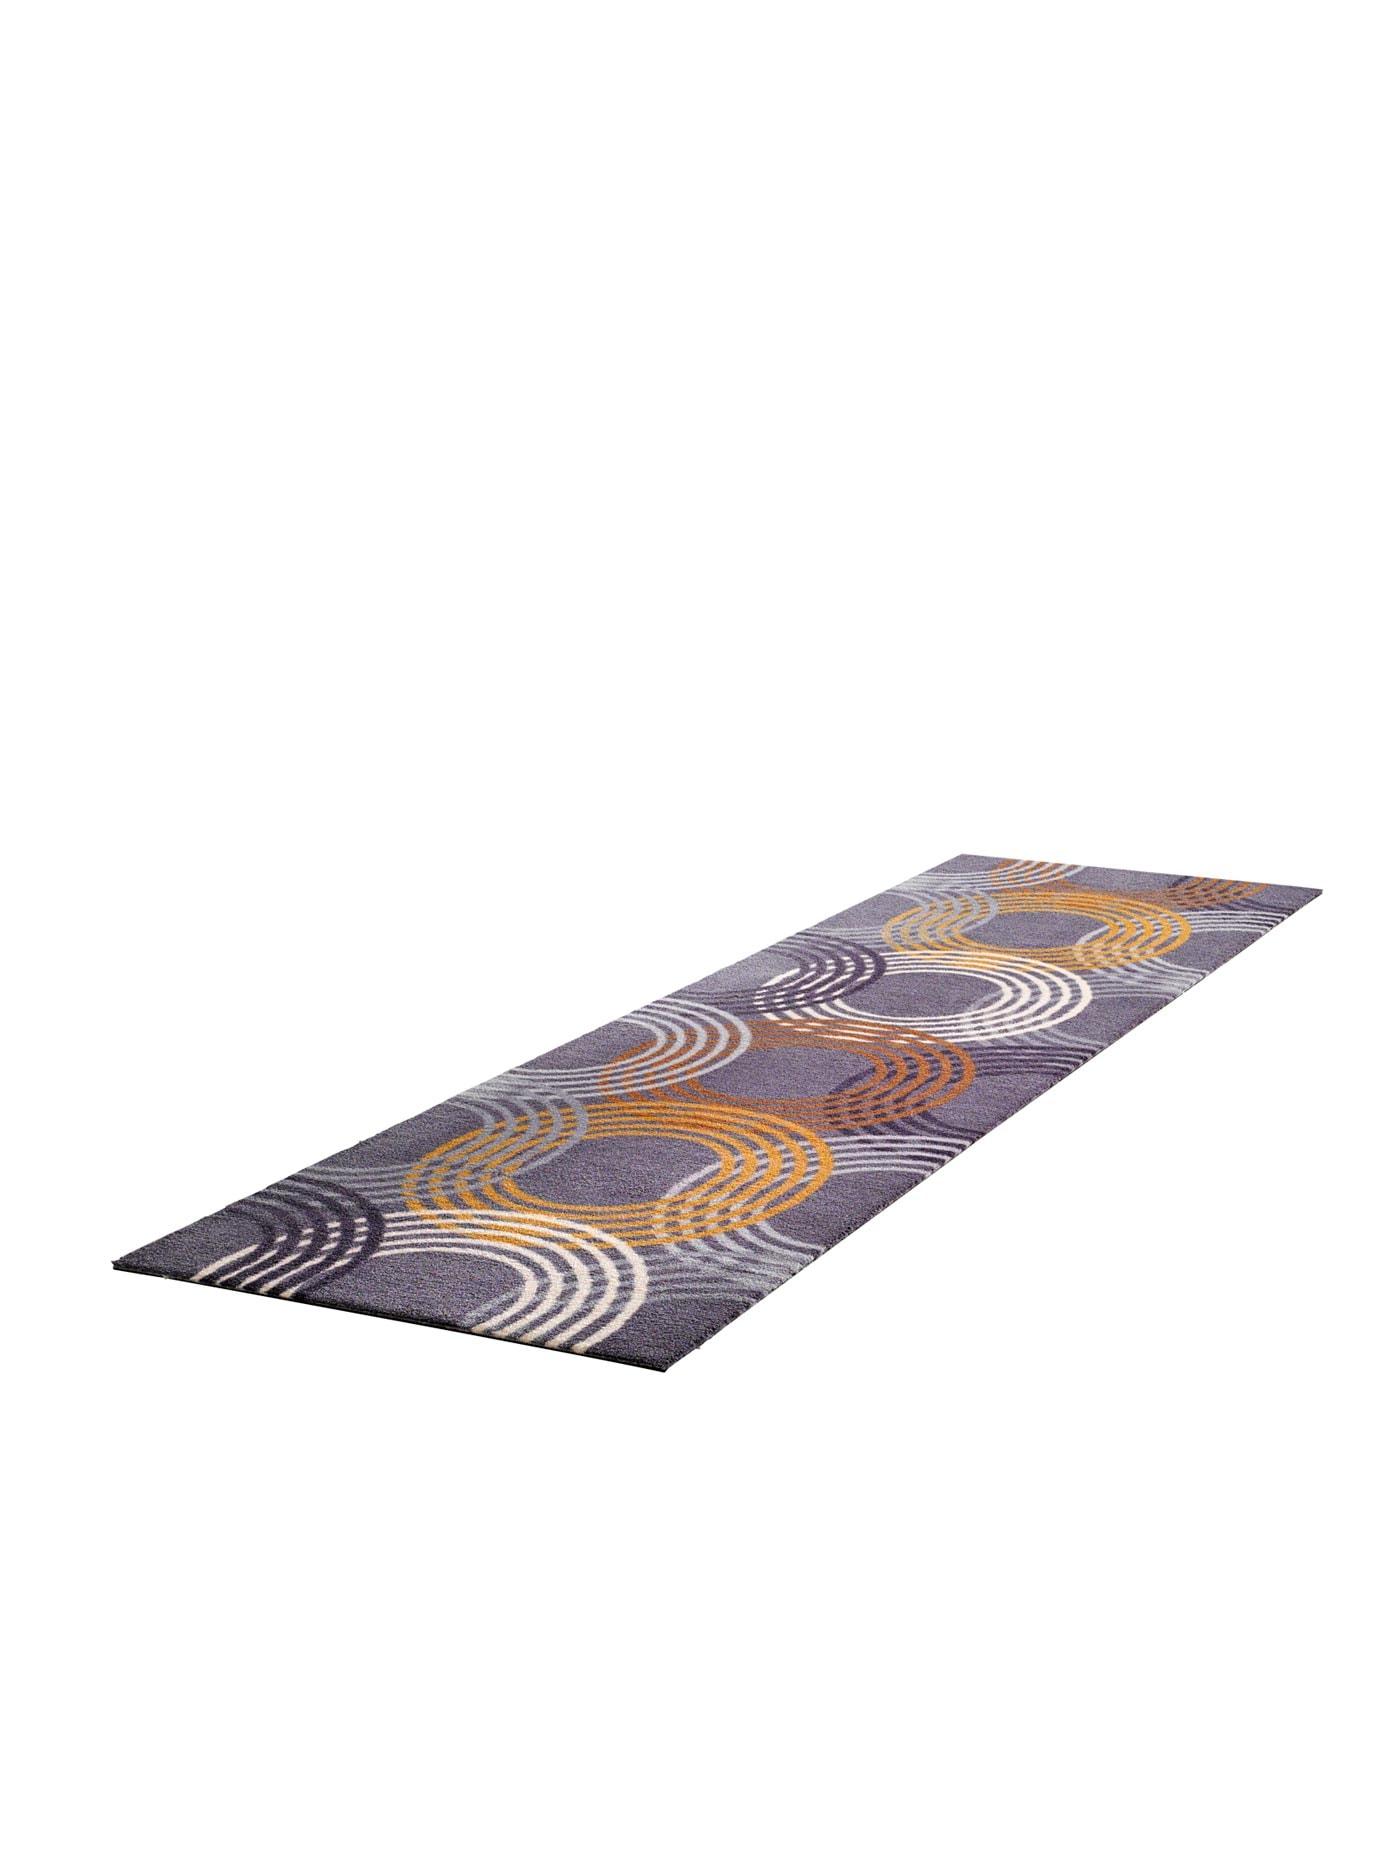 Schmutzfangmatte grau Diele Flur Teppiche, uni